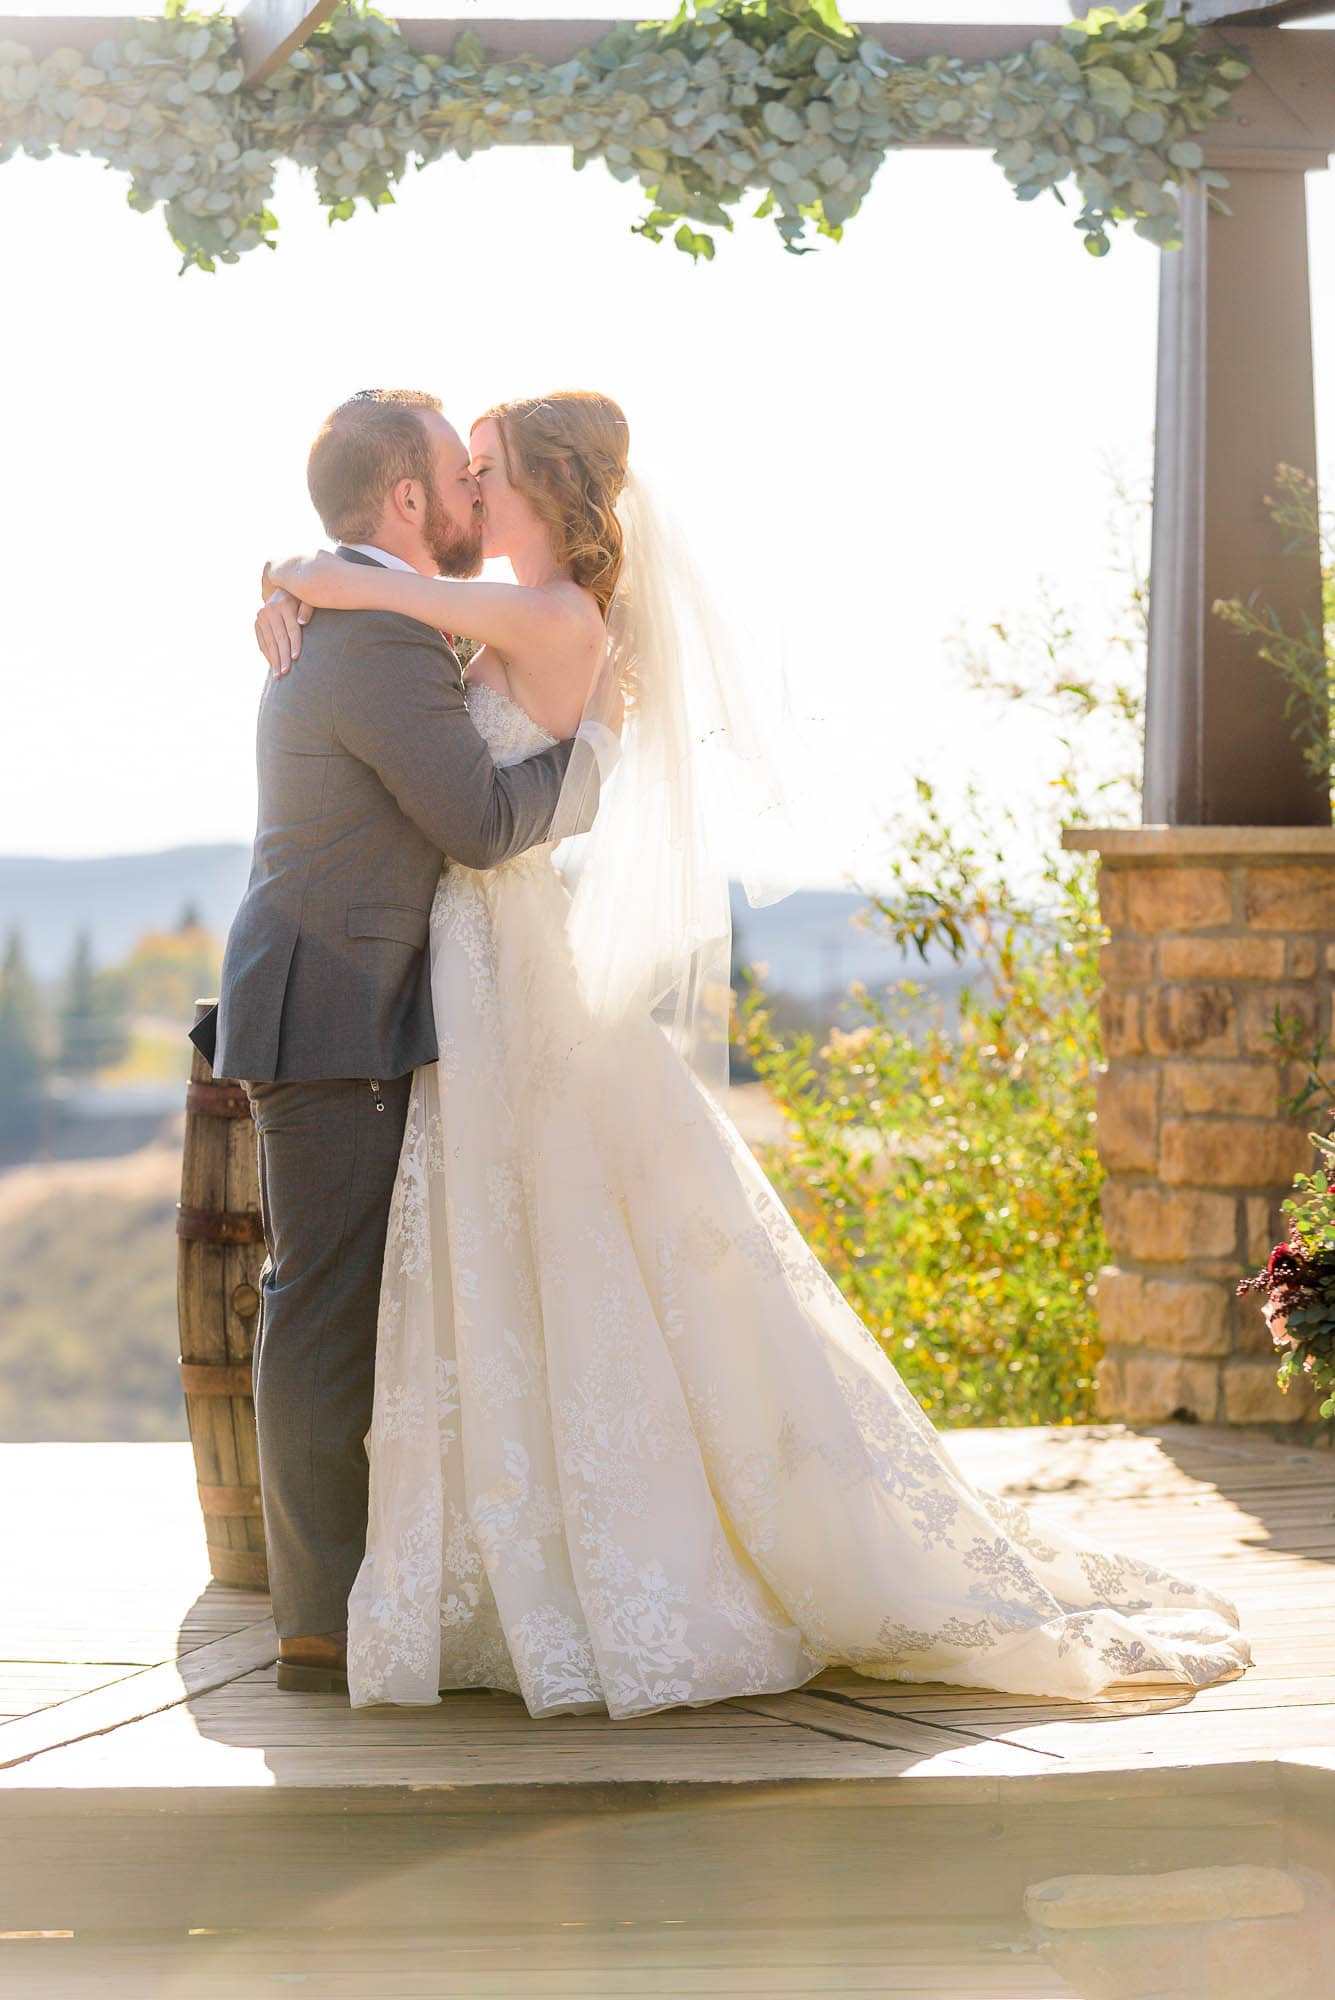 290_Alan_and_Heidi_Serendipity_Garden_Wedding_10-27-2018